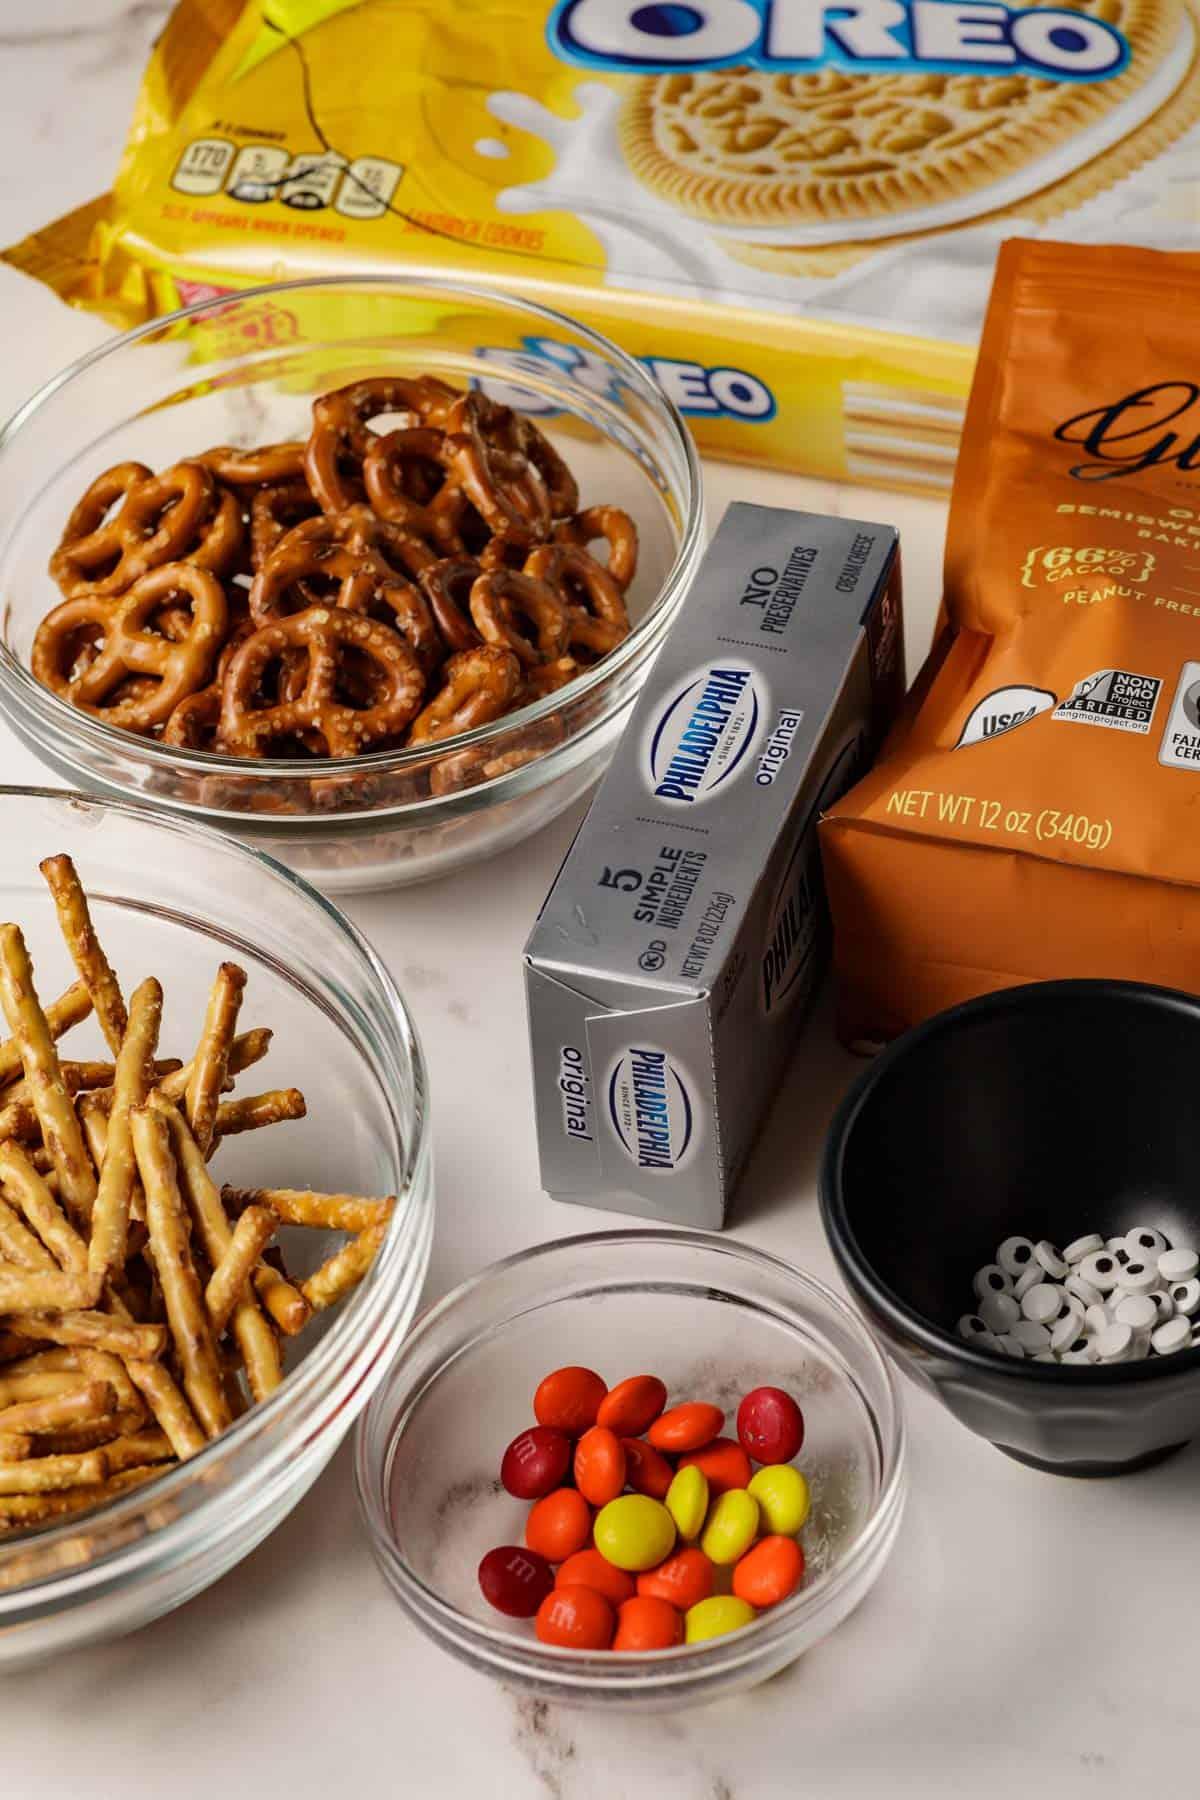 Ingredients for Turkey Oreo Truffles